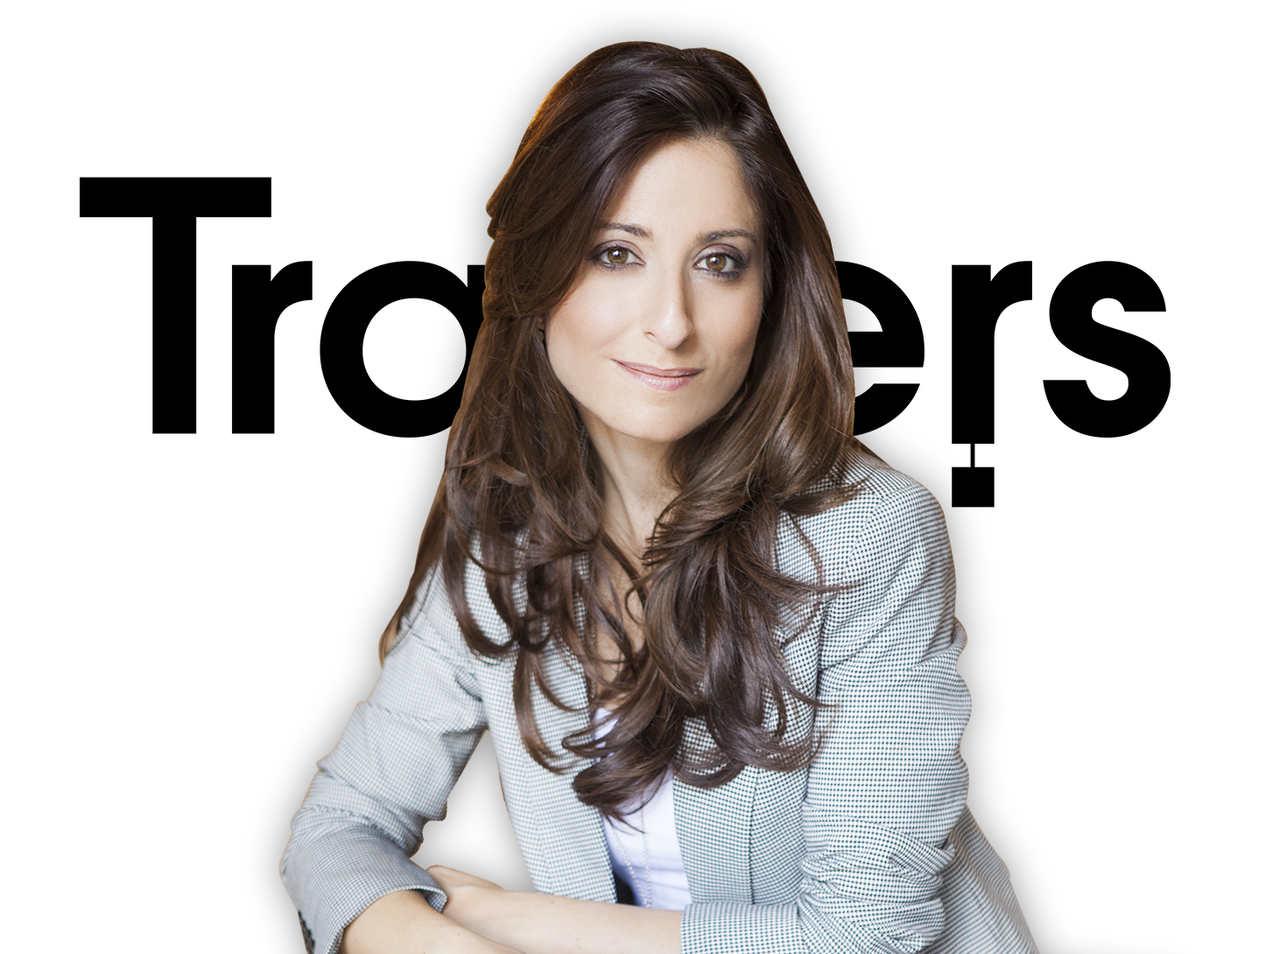 Mónica Galán's photo - Canal Trader